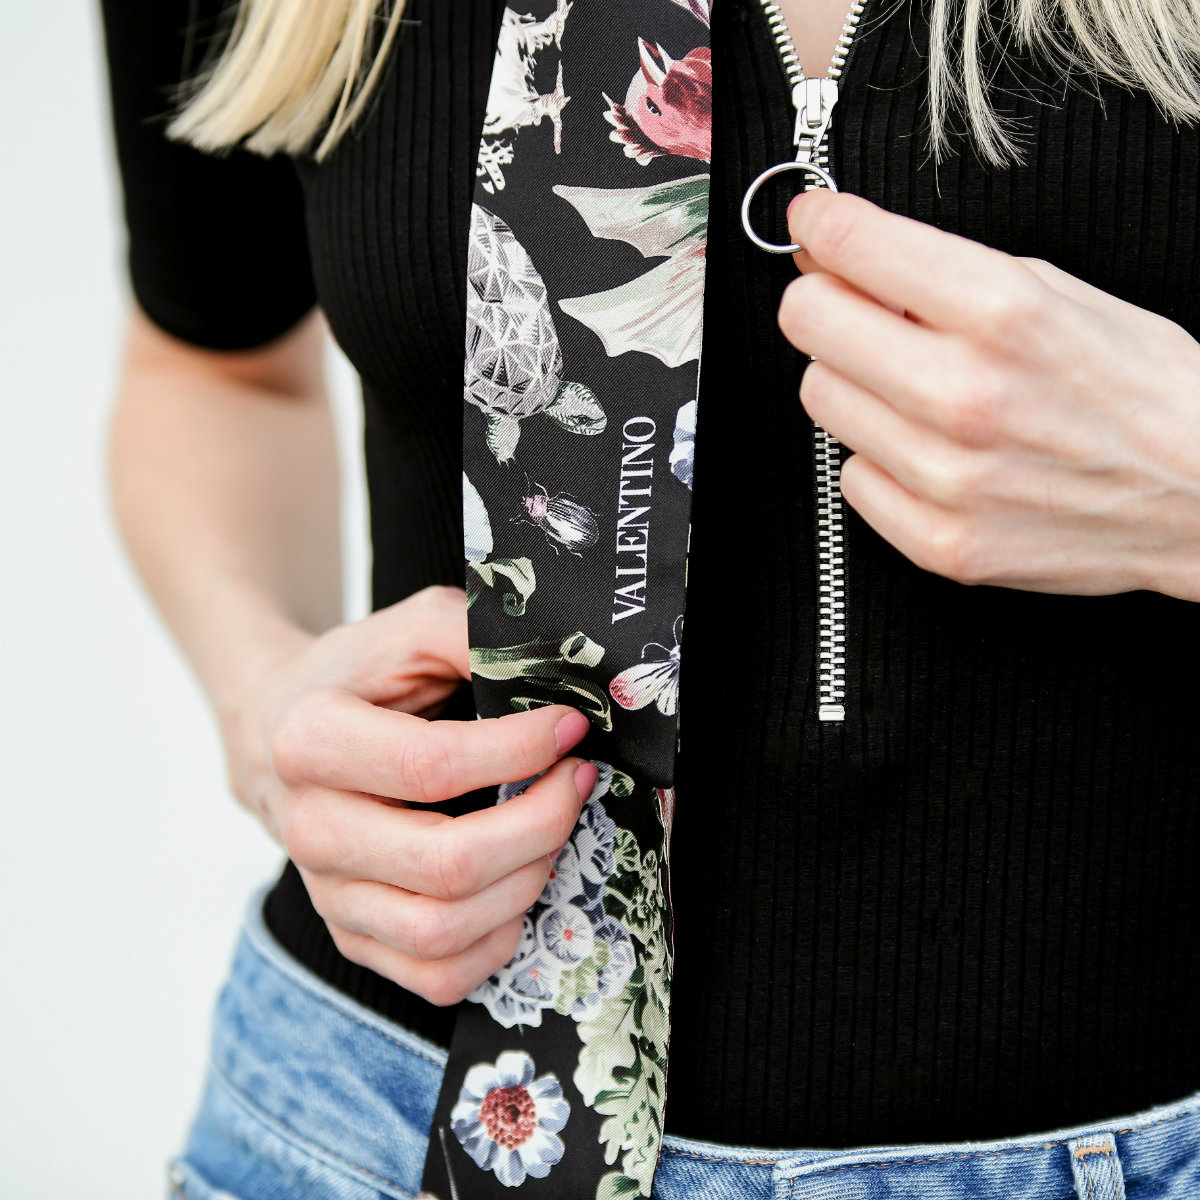 Fashion_Outfit_Zip_Zipper_Body_Valentino_Scarf-14_pixlr